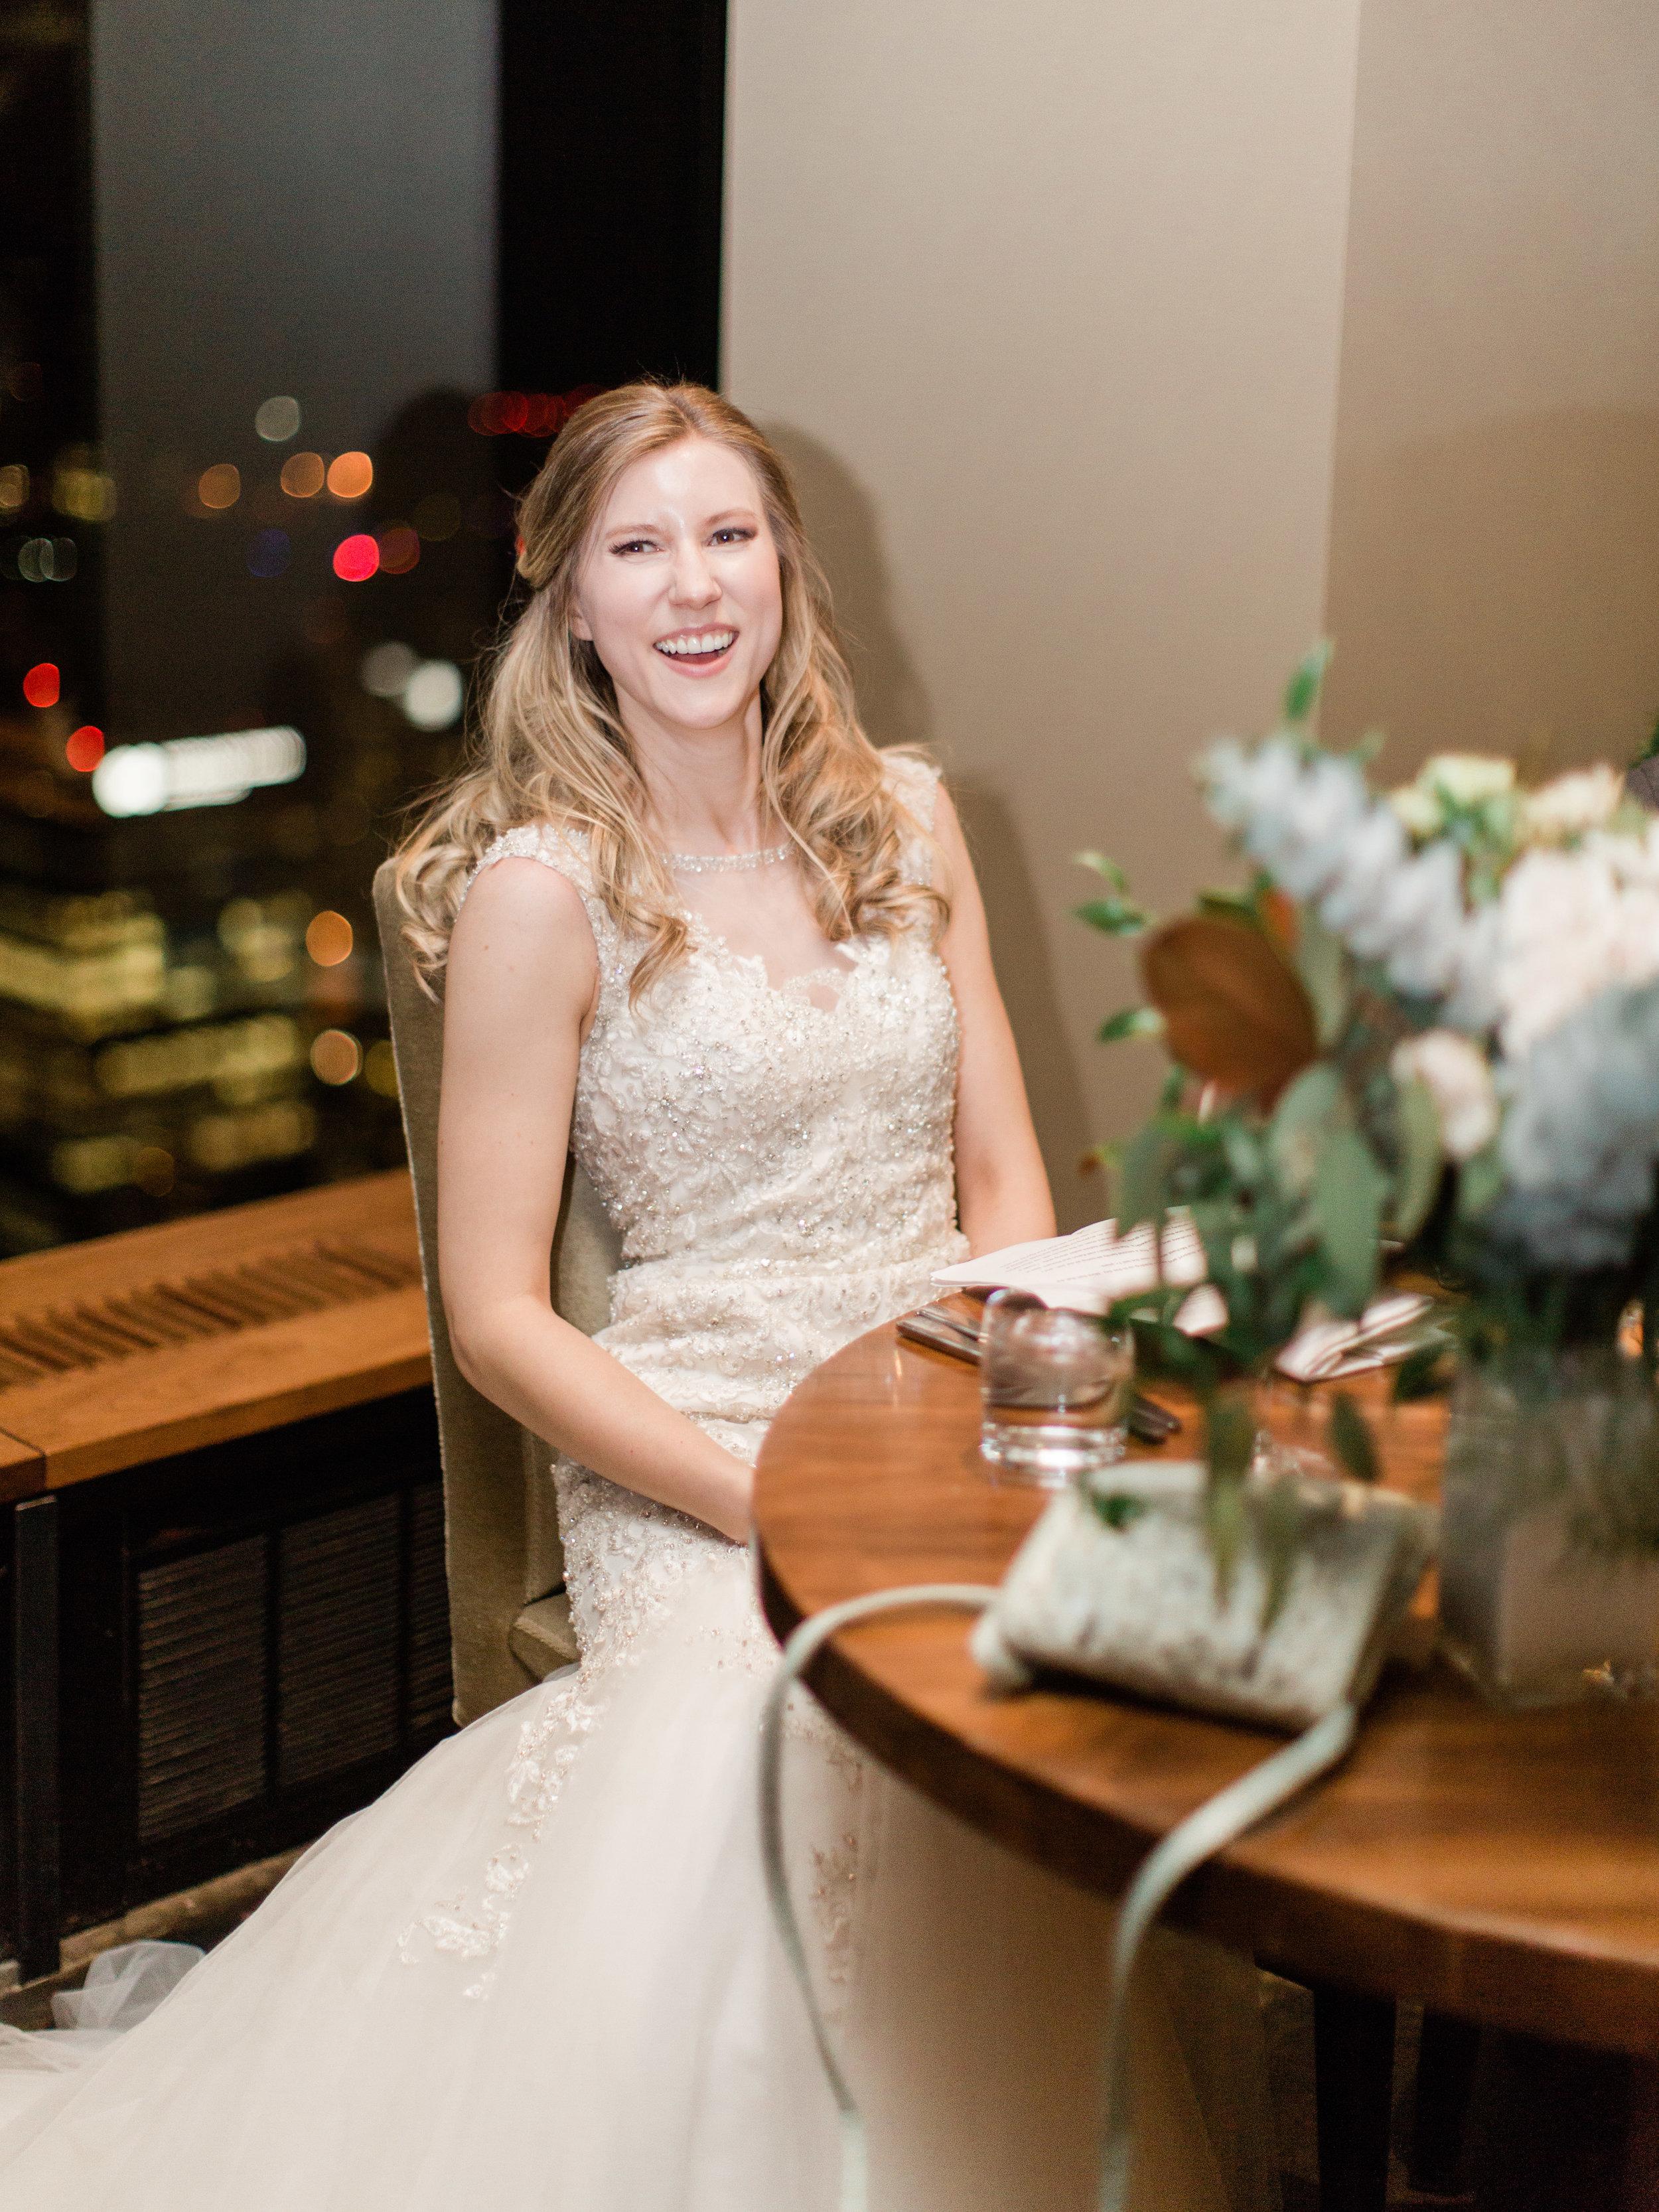 Toronto-wedding-photographer-downtown-winter-wedding-intimate-restaurant-canoe163.jpg